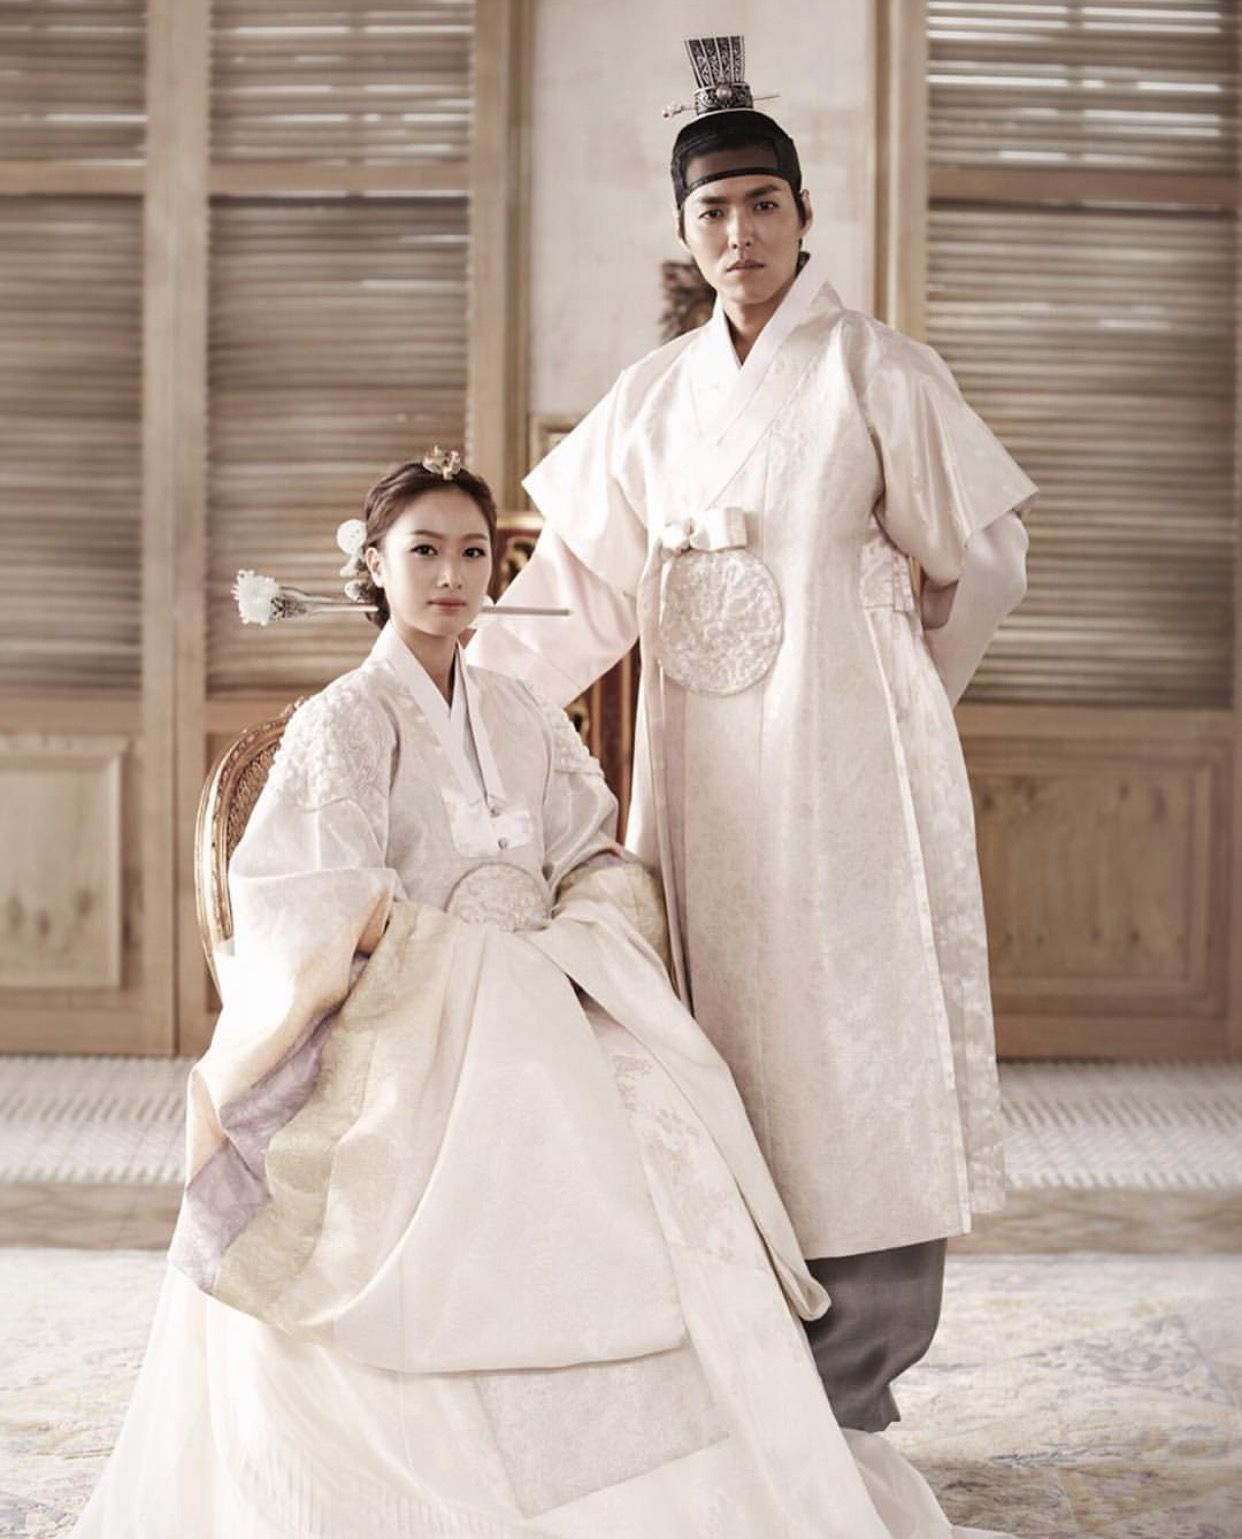 c8fc11615748027d4de6d141ac12ac49 - Traditional Marriage Cloth